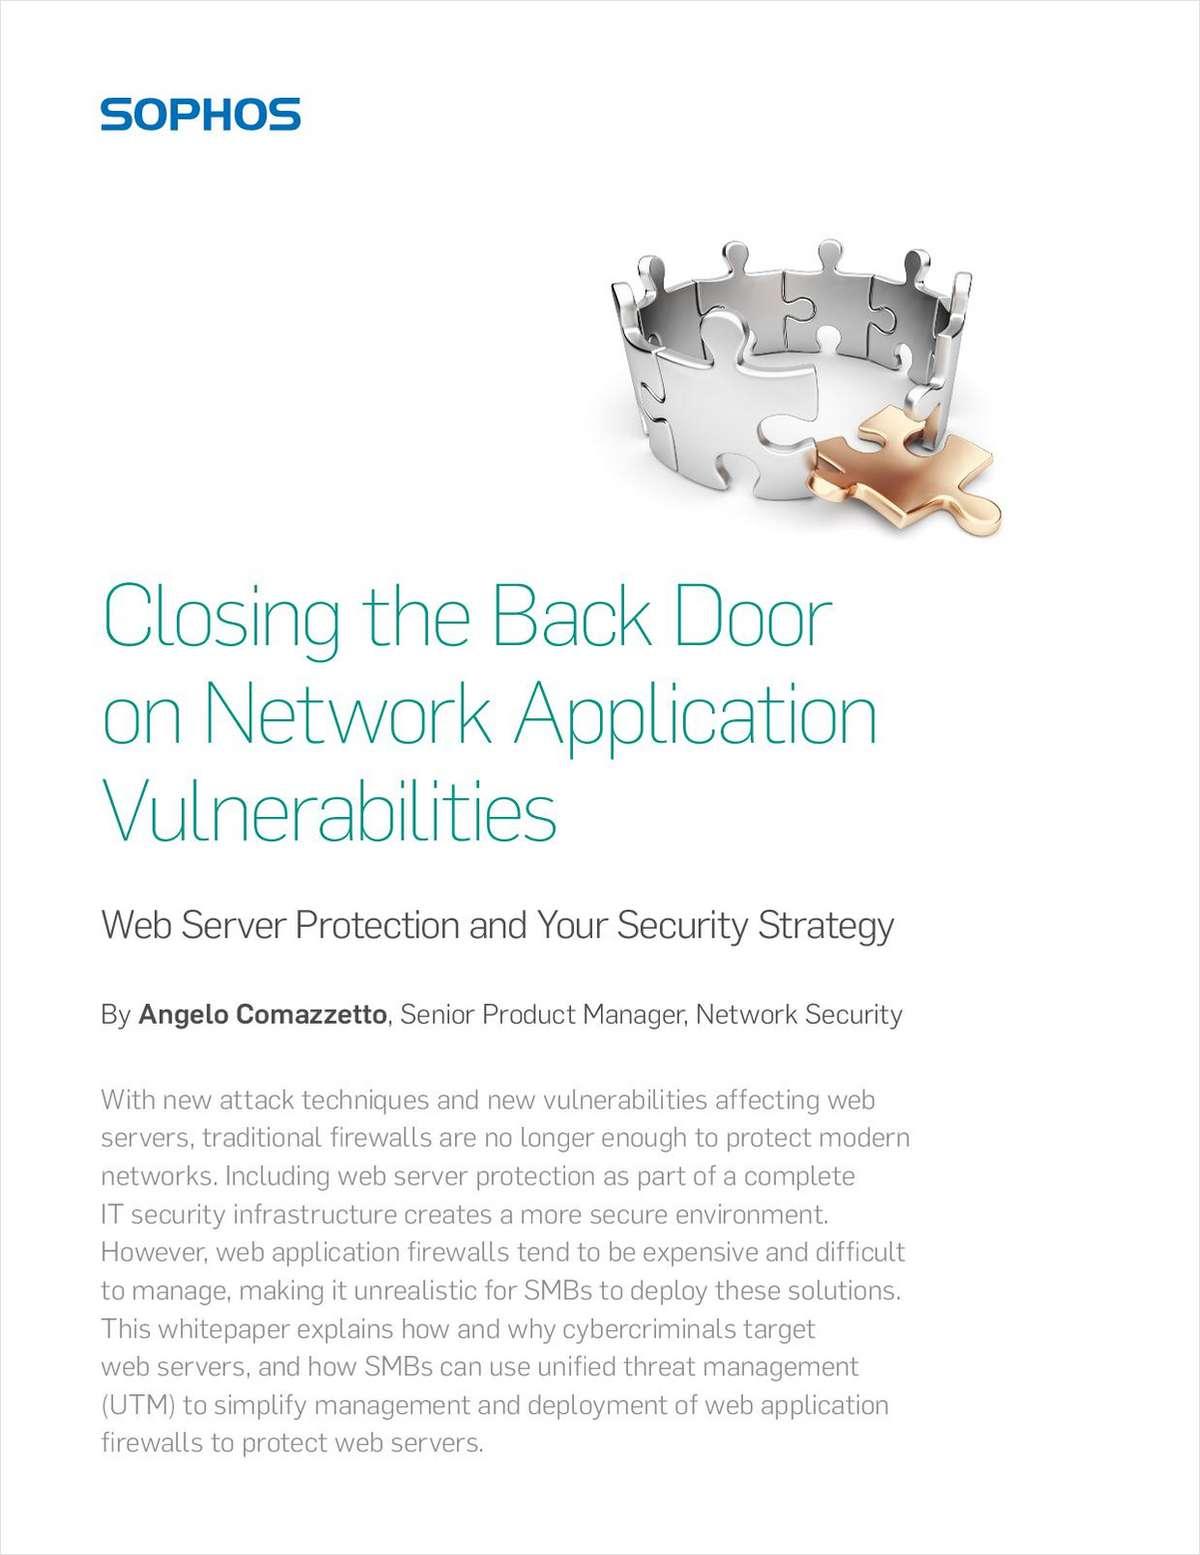 Closing the Back Door on Network Application Vulnerabilities